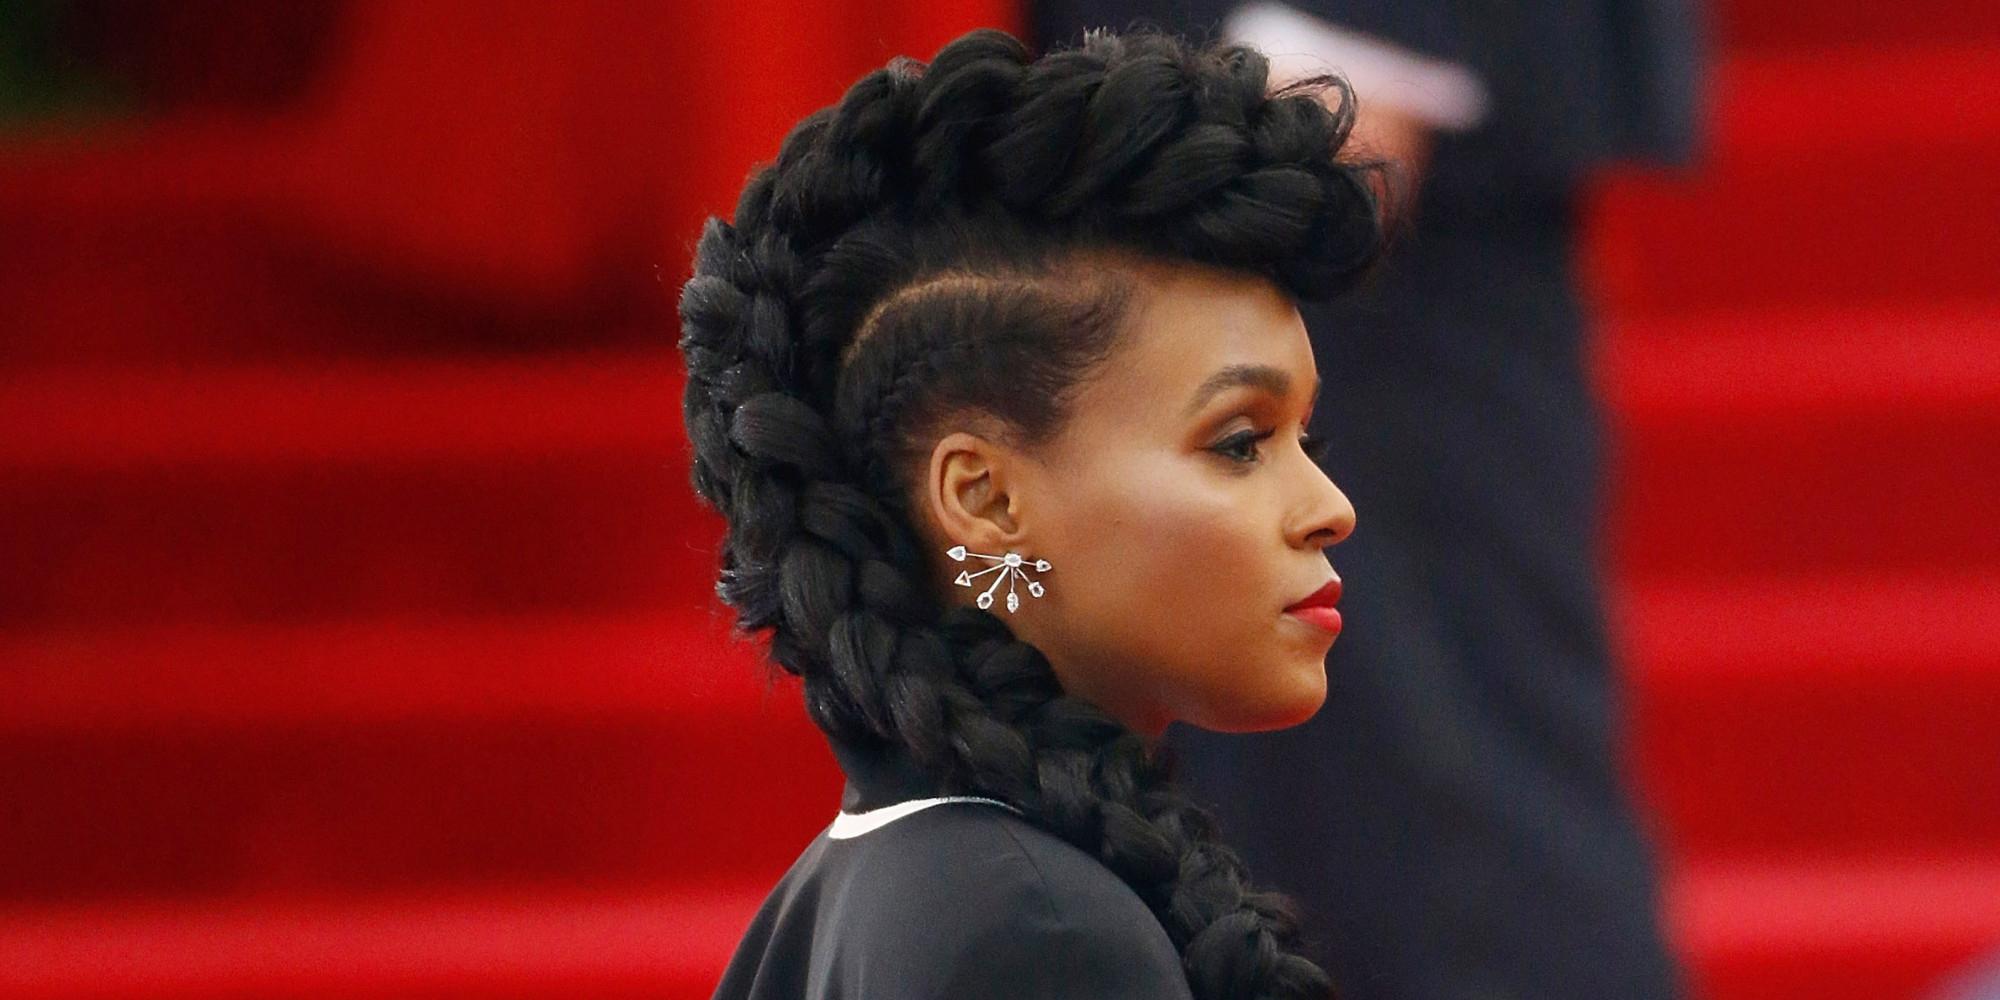 40 Mohawk Hairstyles For Black Omen Inside Mohawk Short Hairstyles For Black Women (View 9 of 25)